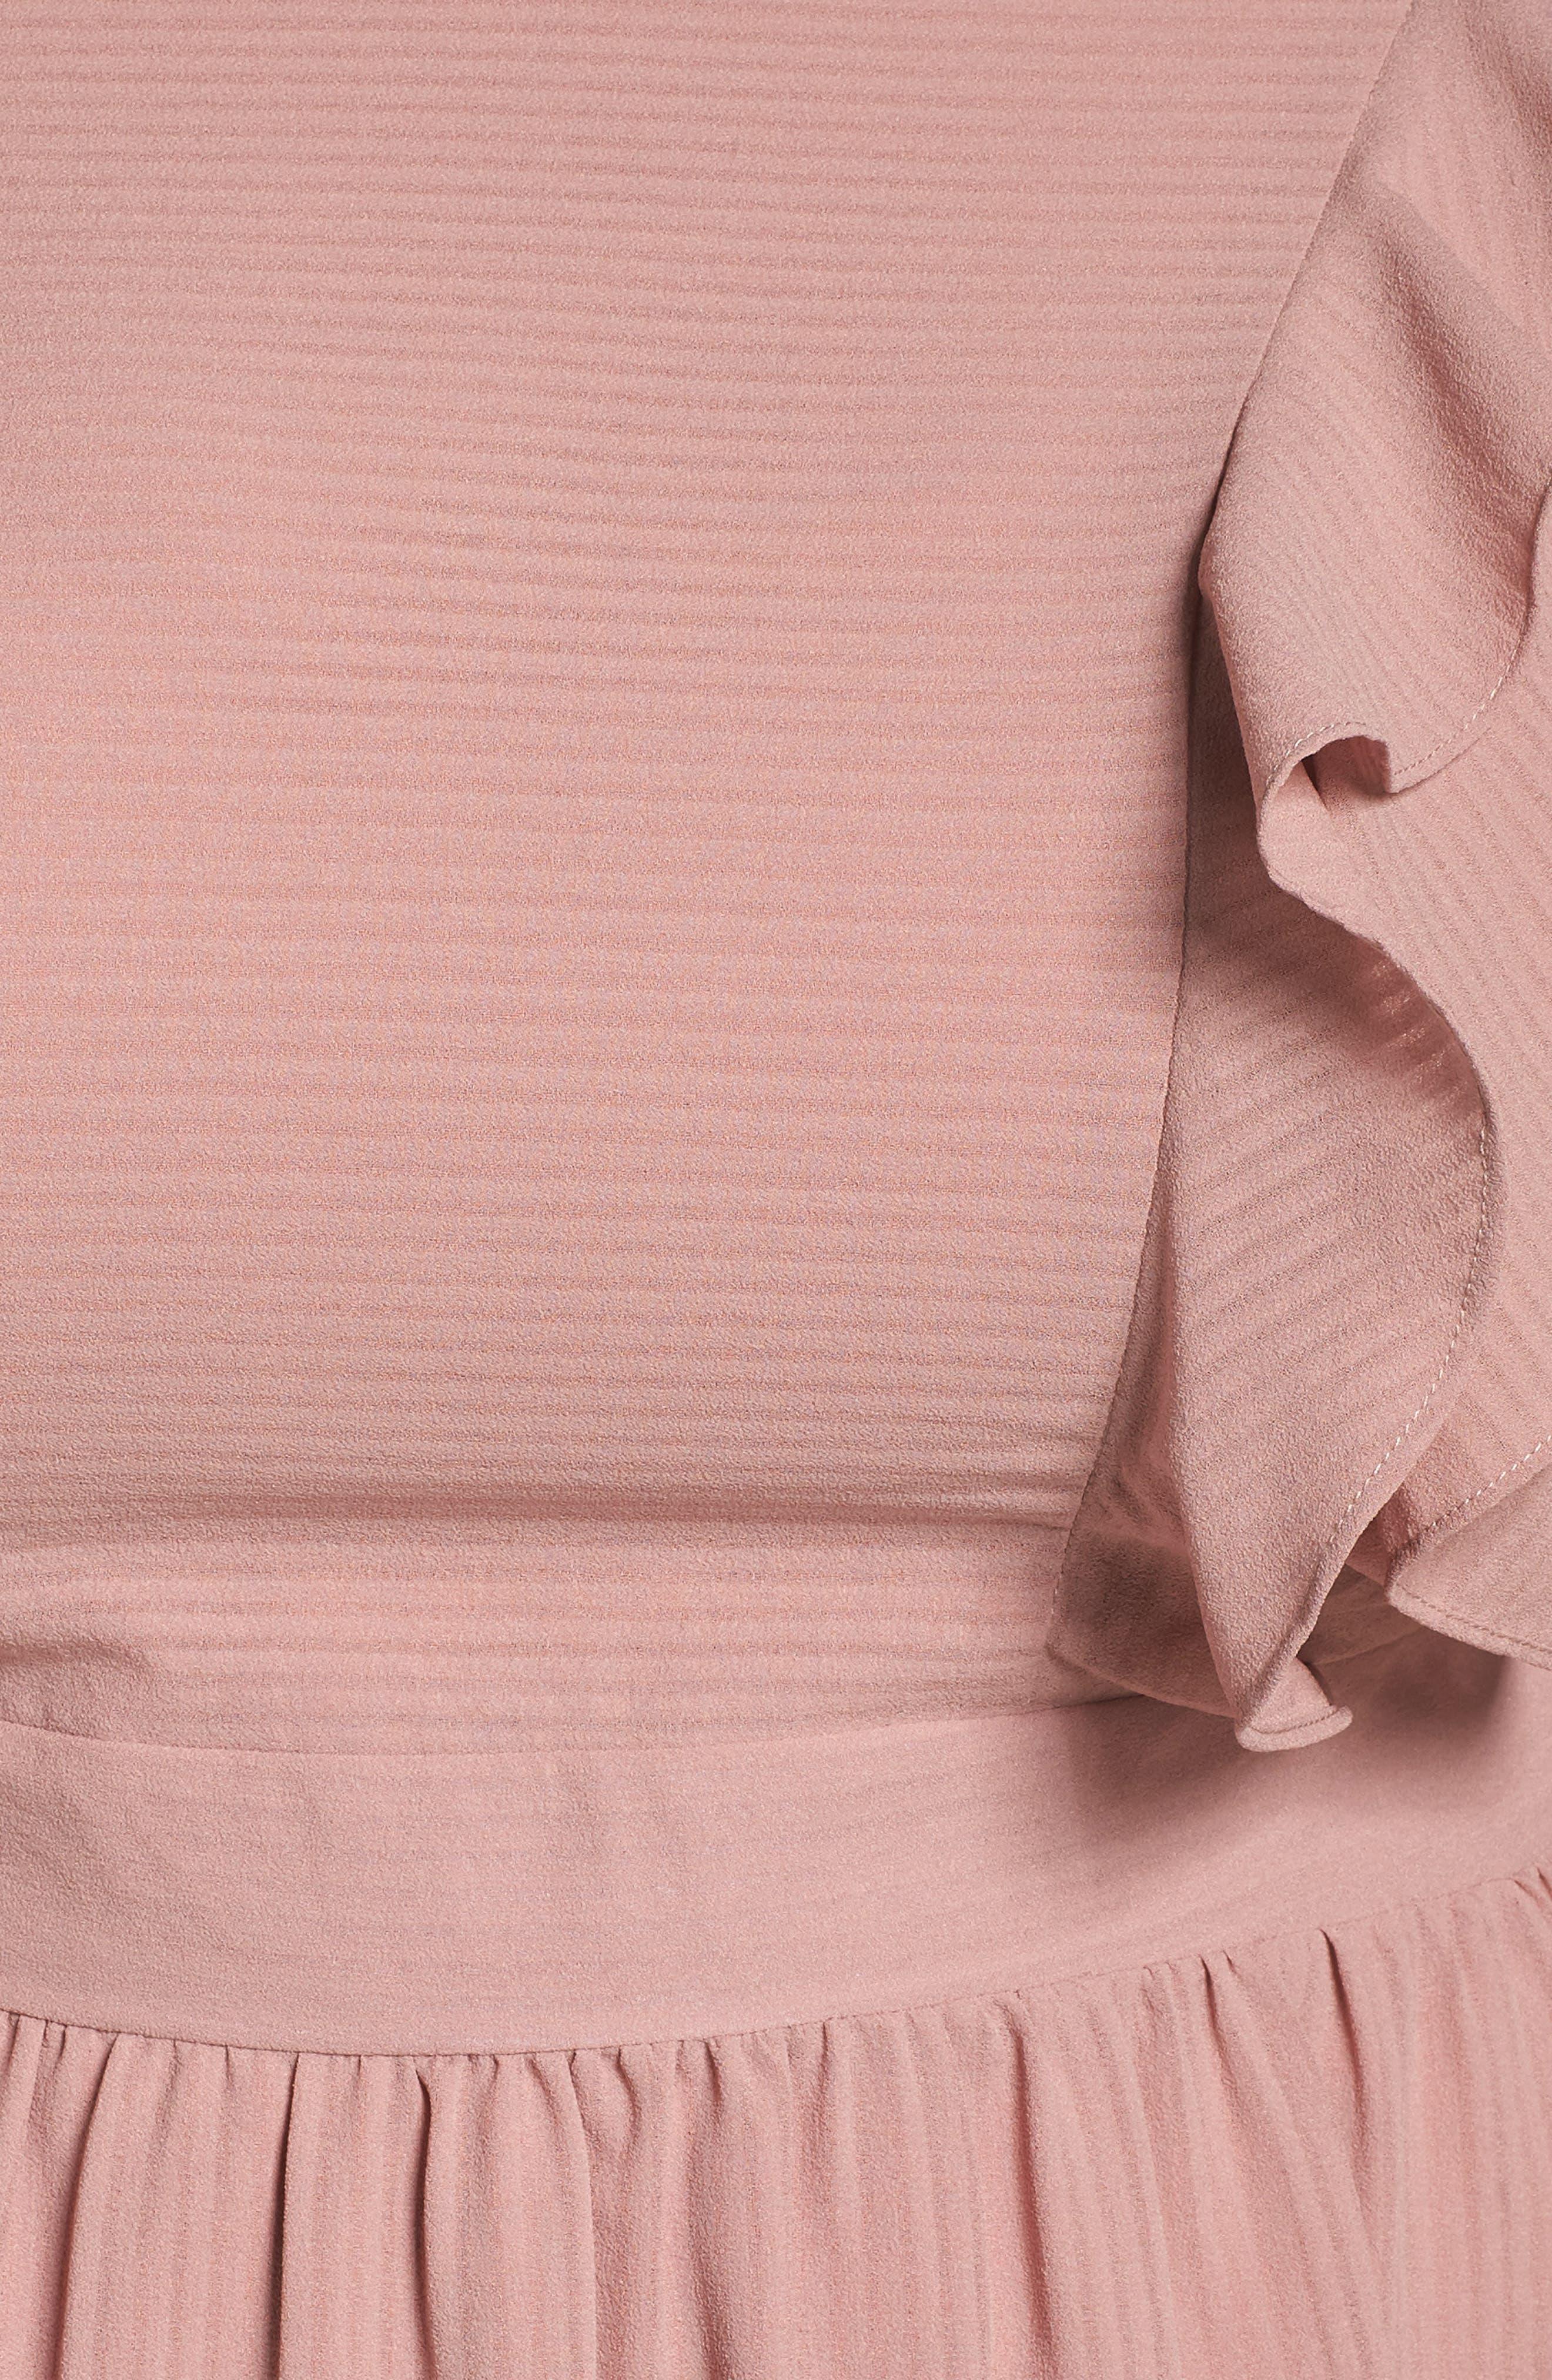 Ruffle Sleeve Fit & Flare Dress,                             Alternate thumbnail 6, color,                             681